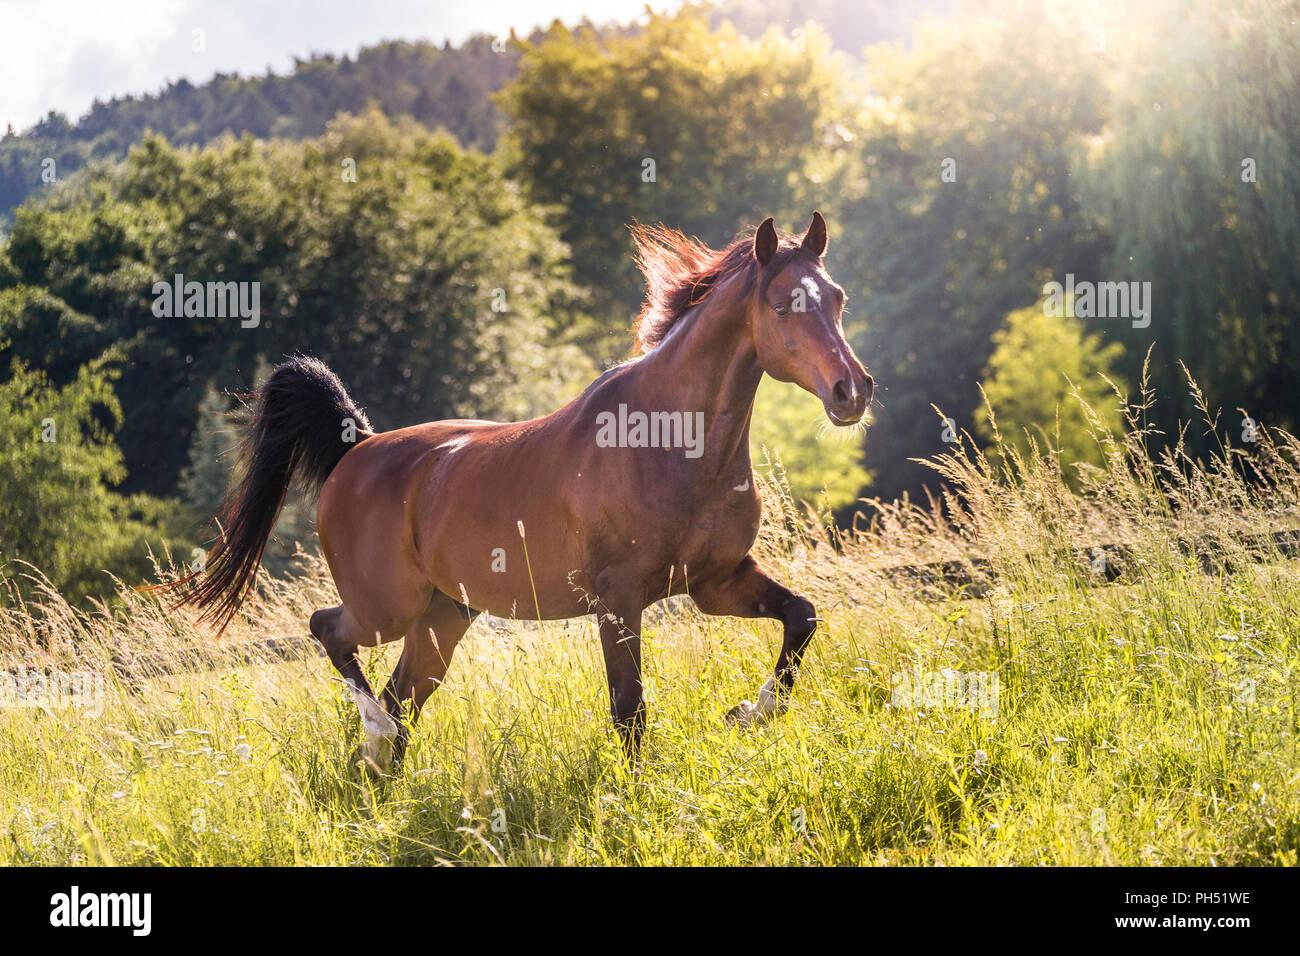 Arab Horse. Bay gelding trotting on a meadow. Austria - Stock Image